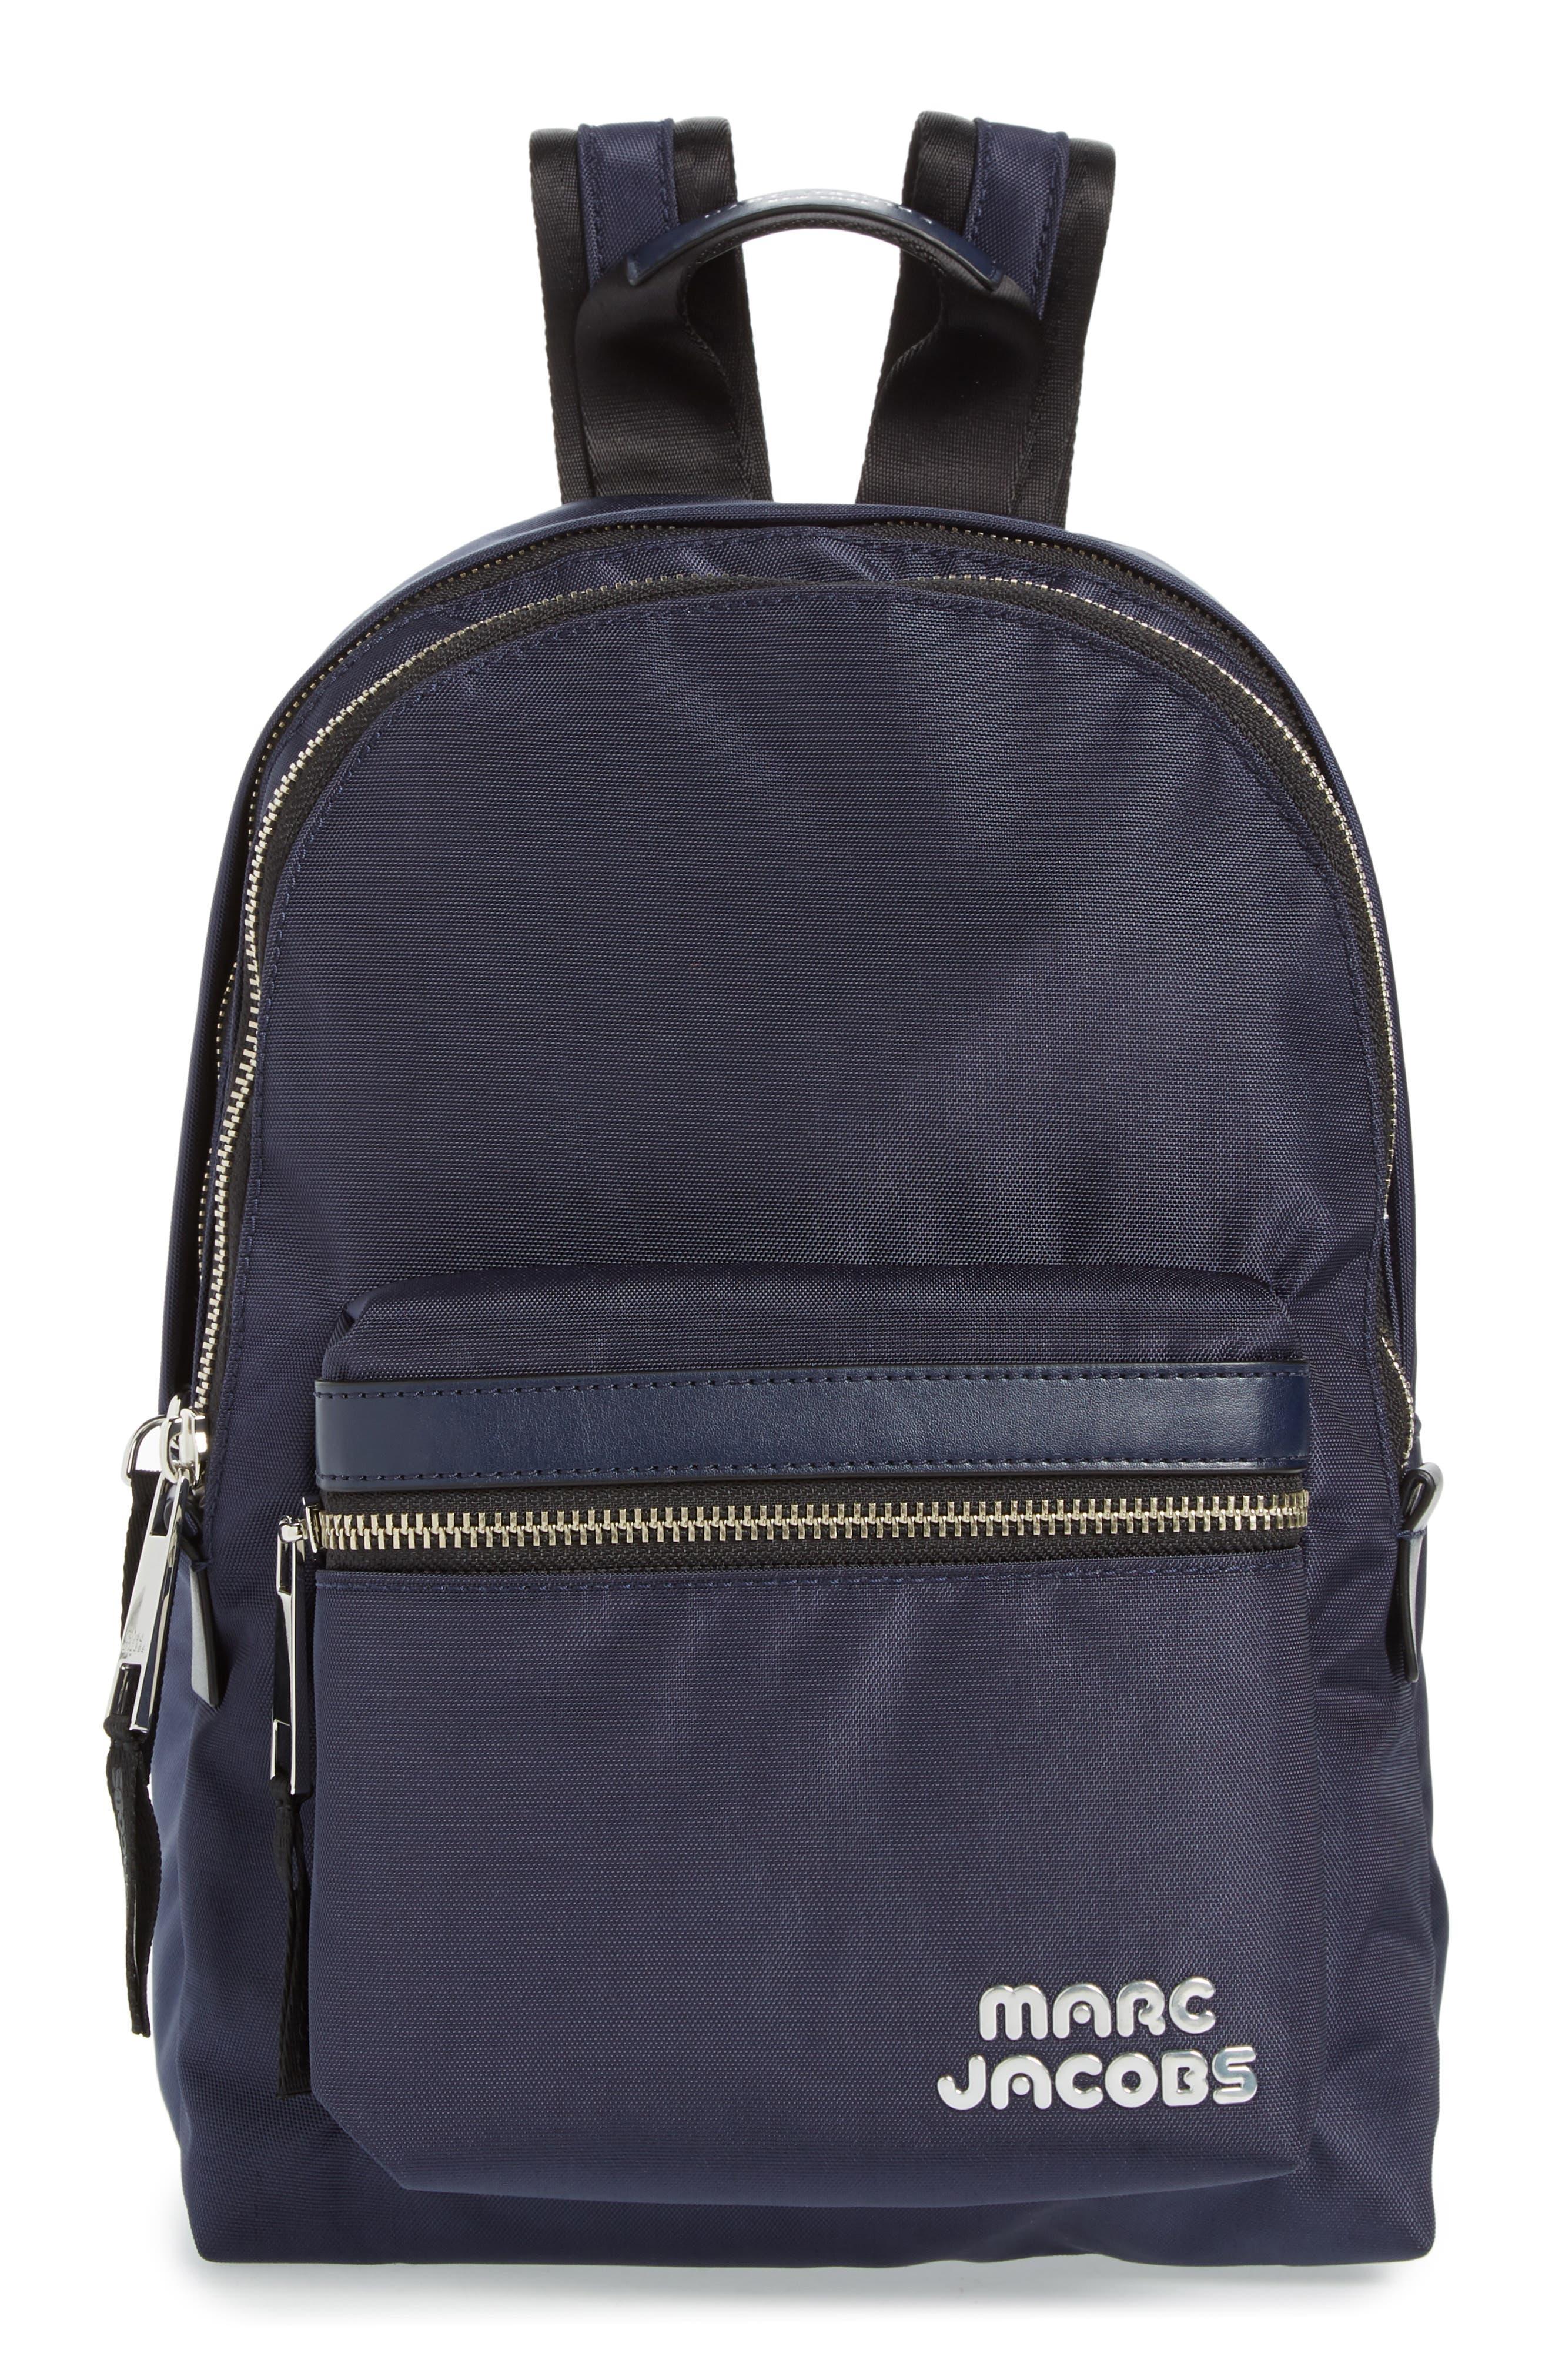 Medium Trek Nylon Backpack,                             Main thumbnail 1, color,                             MIDNIGHT BLUE